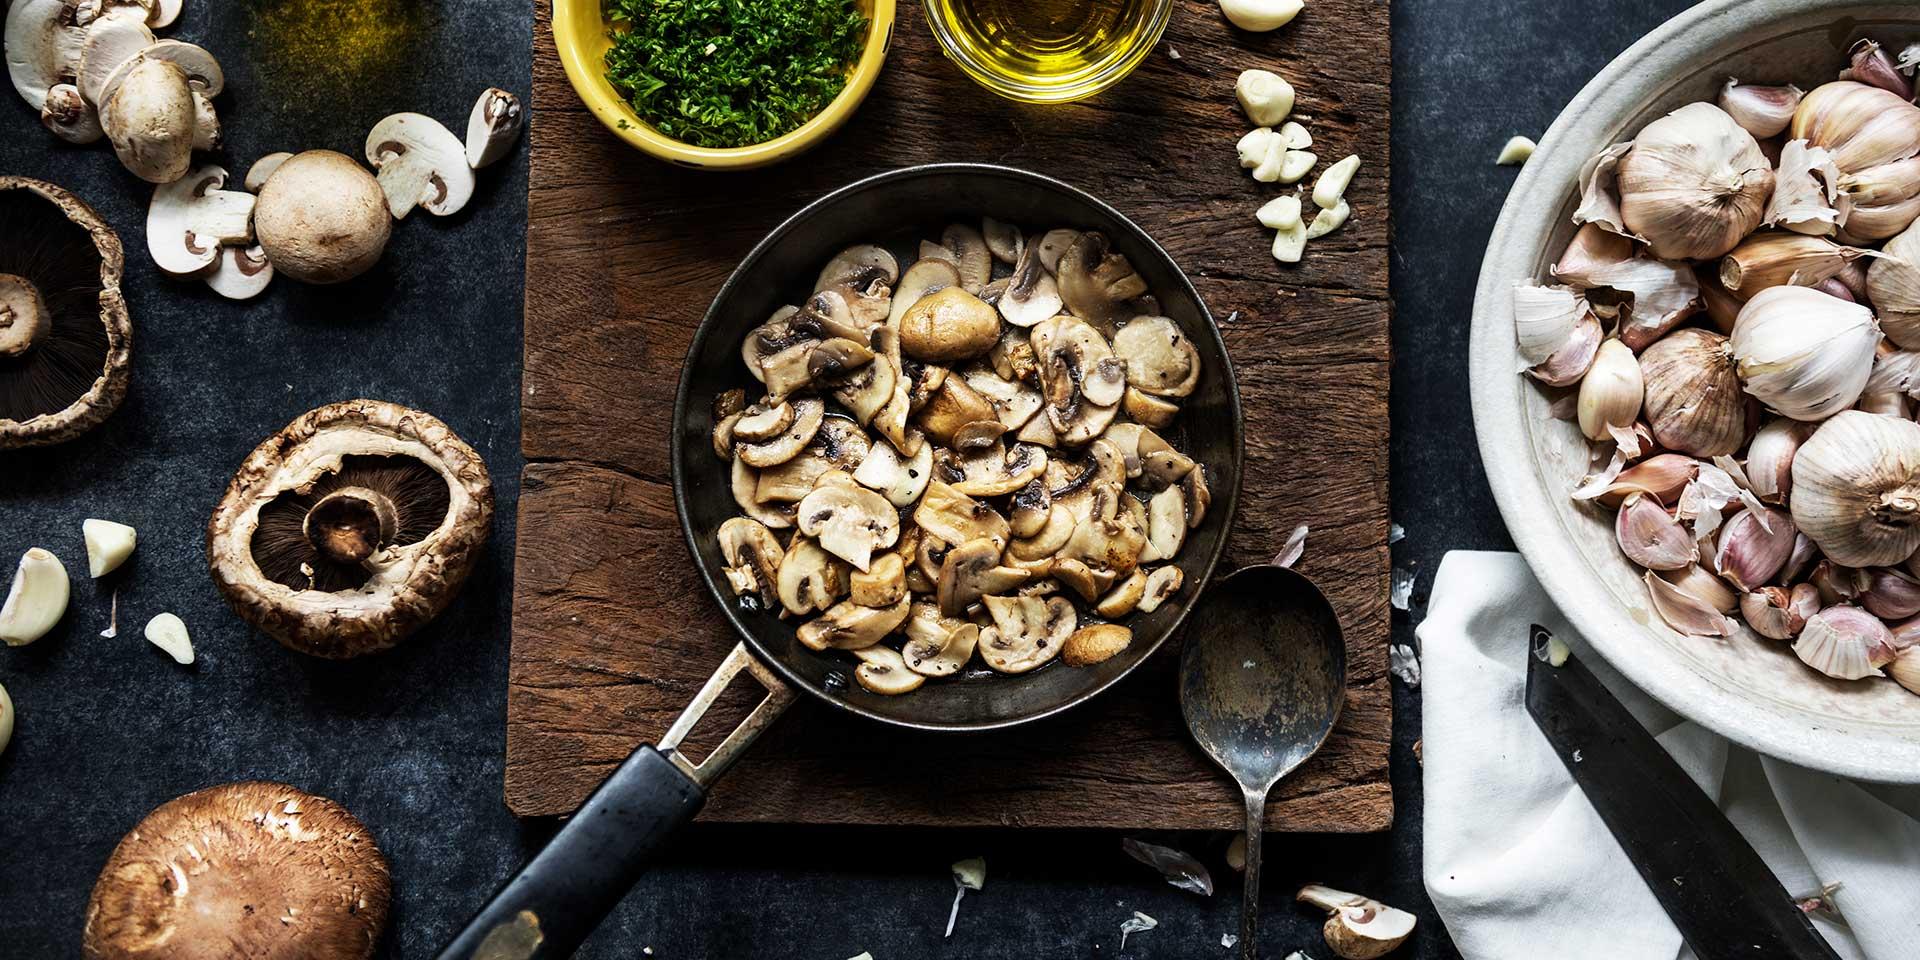 sliced mushroom pieces being cooked, garlic, herbs, portobello mushrooms